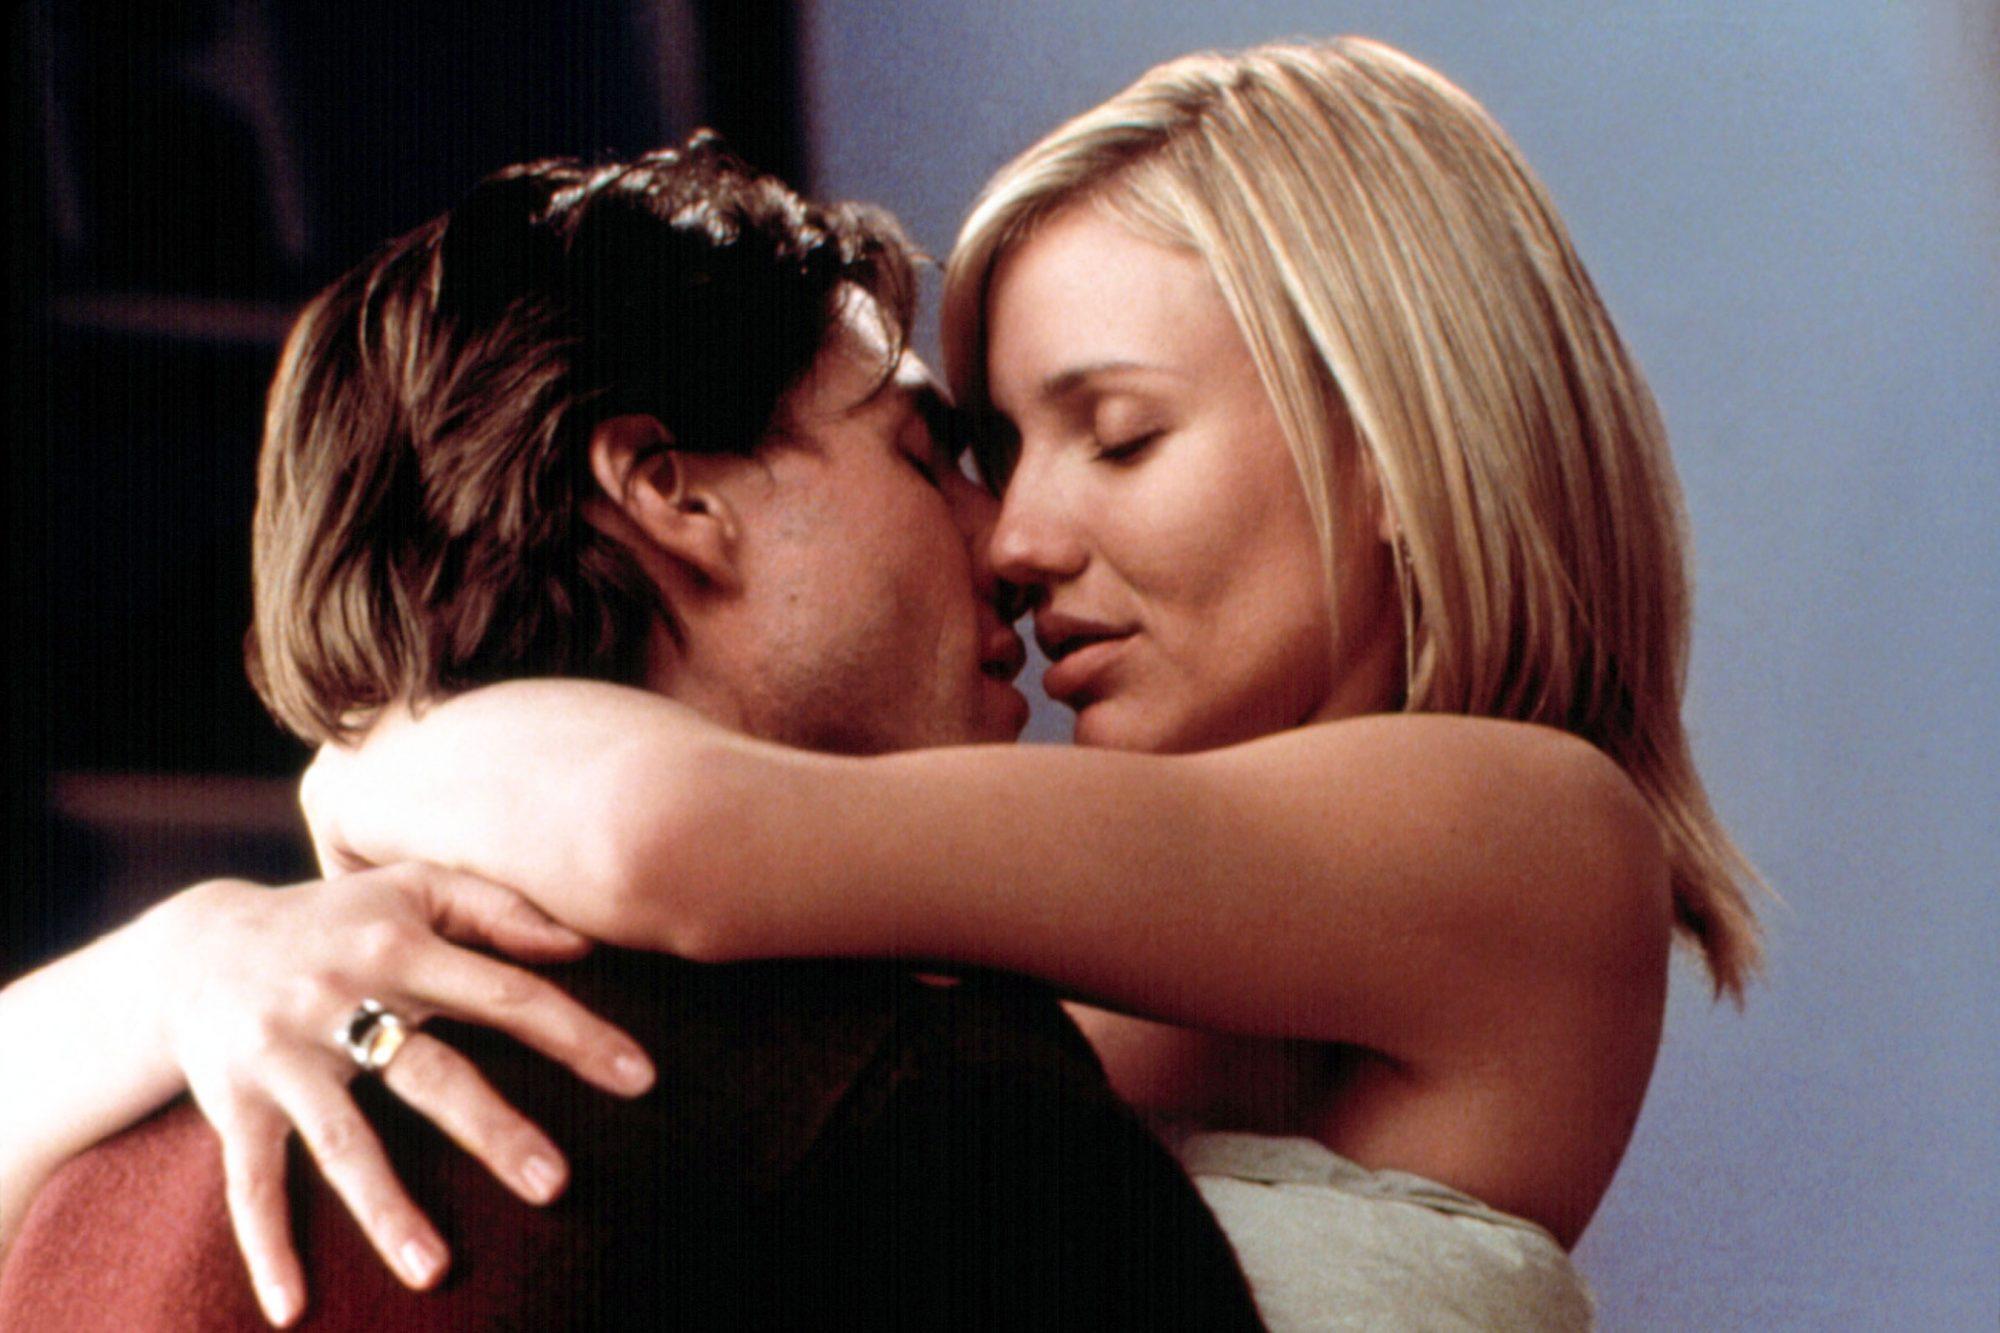 VANILLA SKY, Tom Cruise, Cameron Diaz, 2001